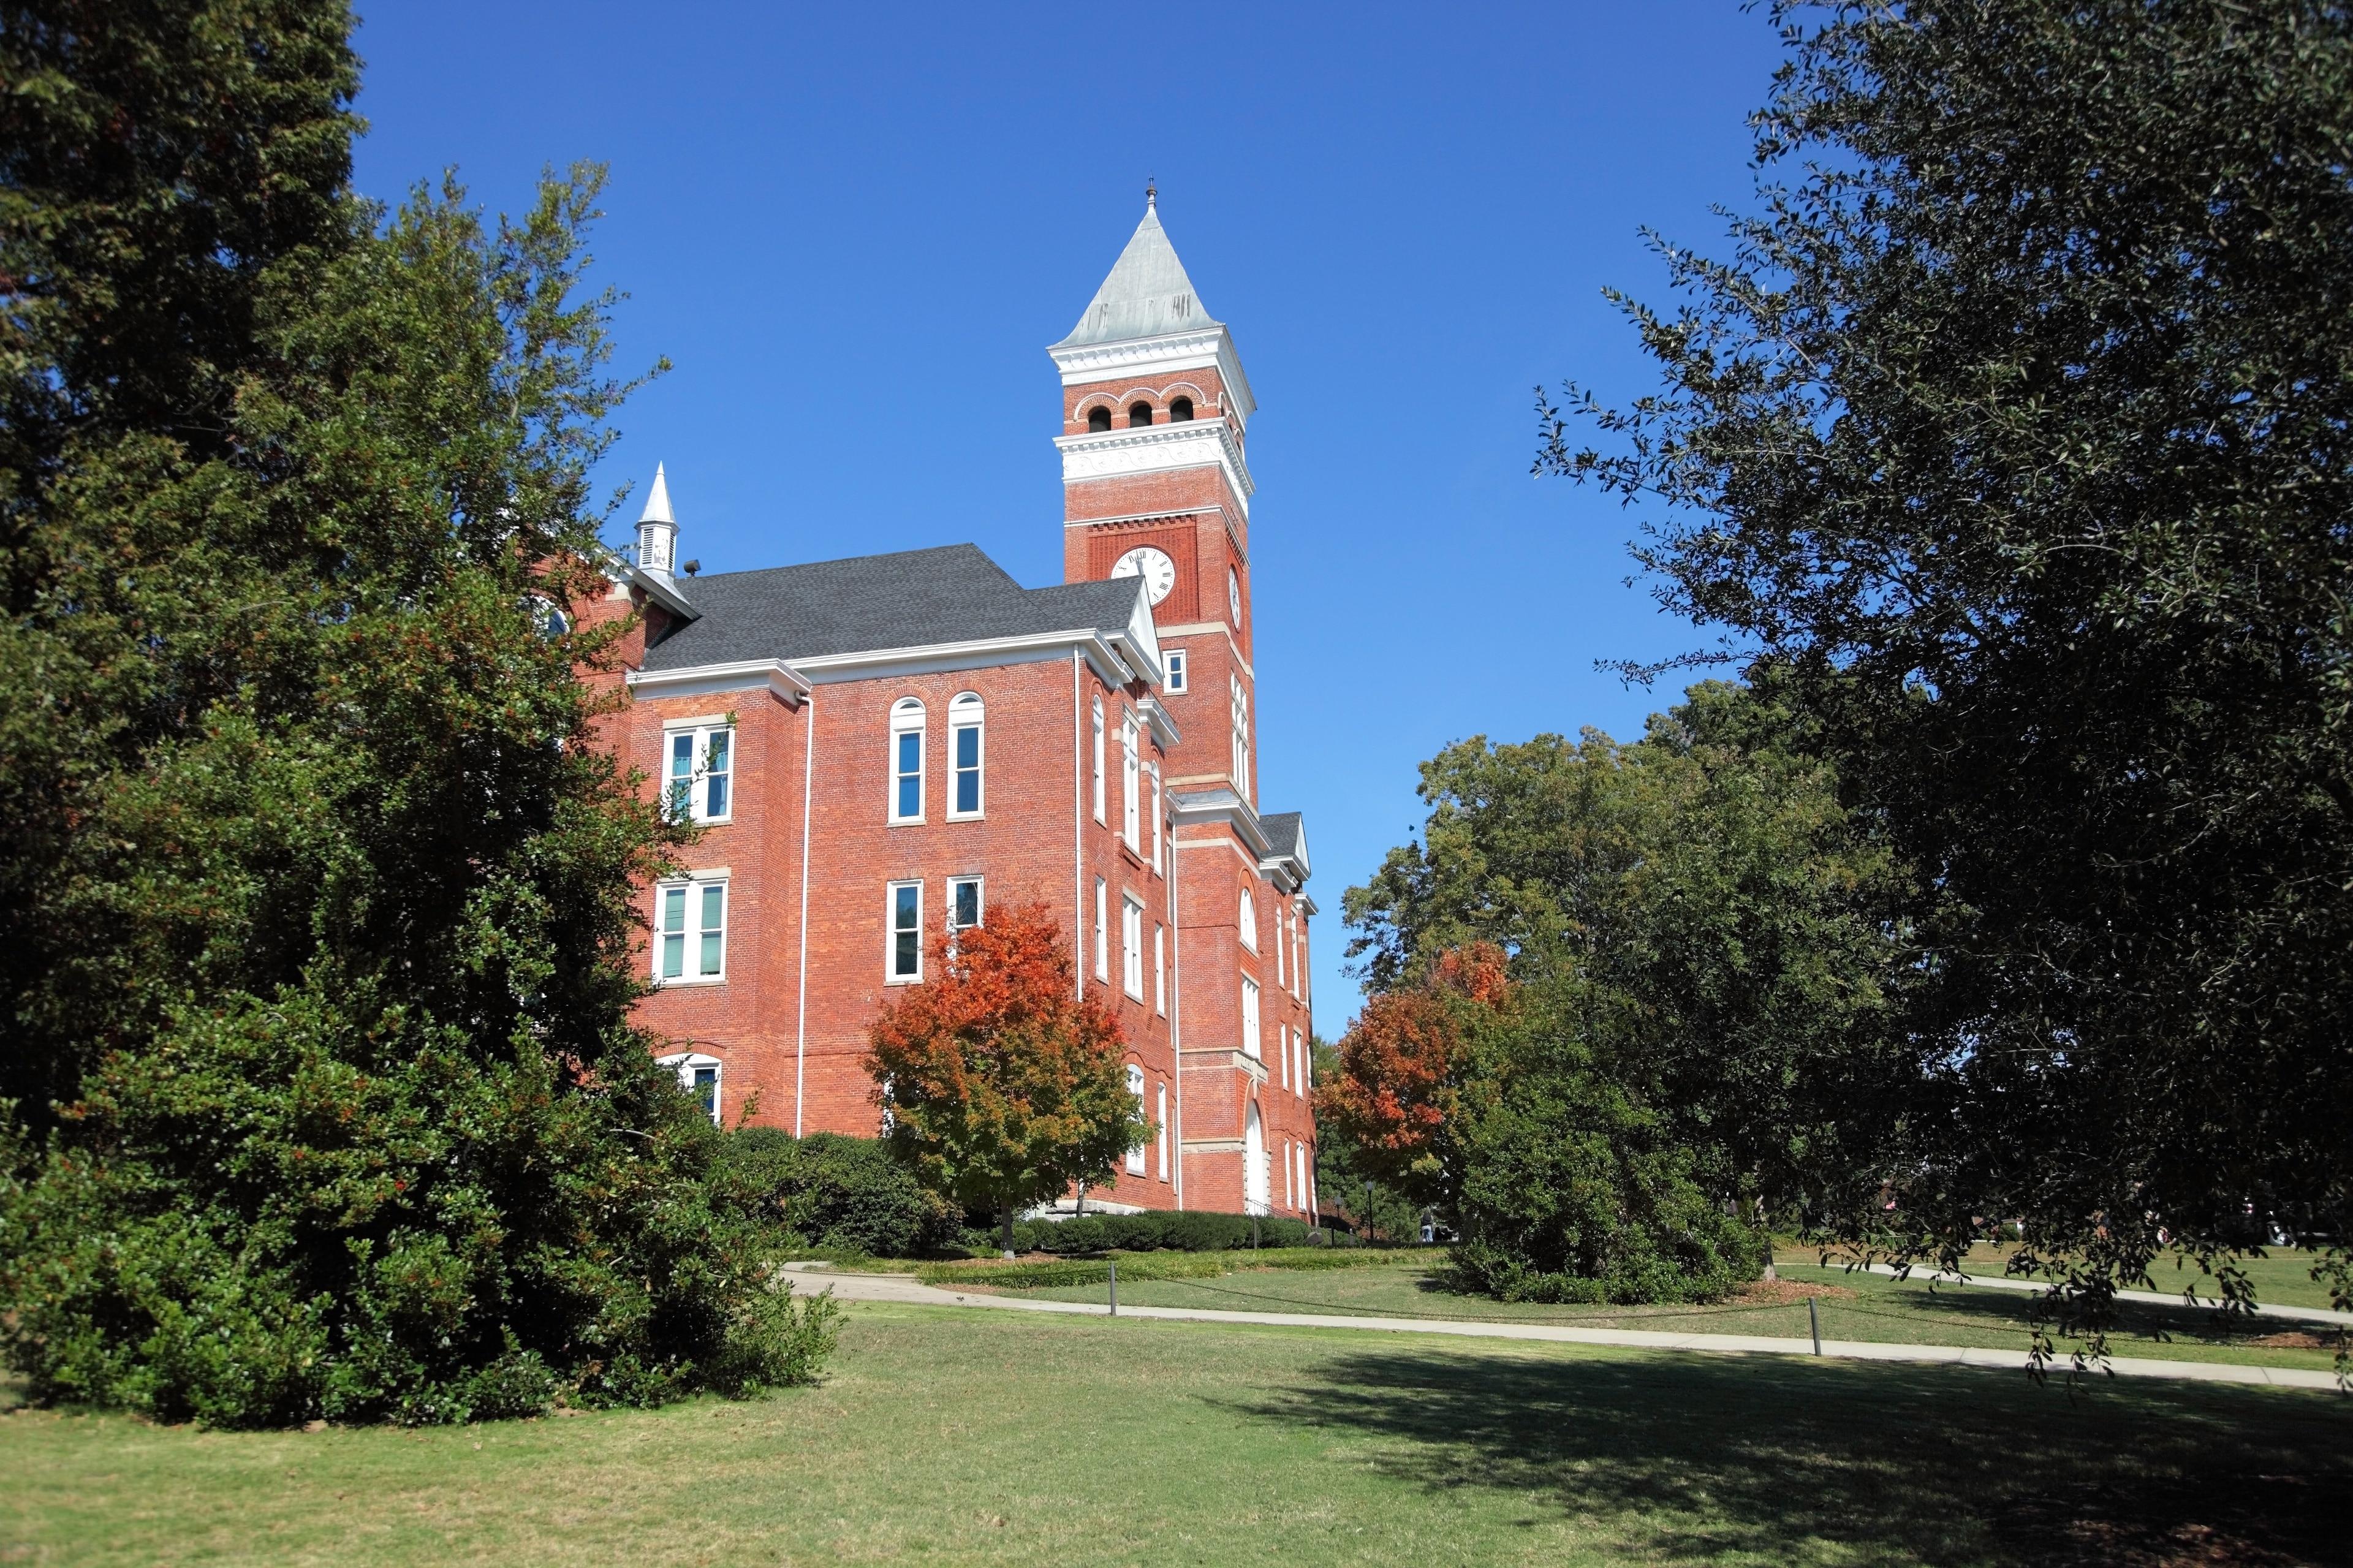 Clemson University, Clemson, South Carolina, United States of America